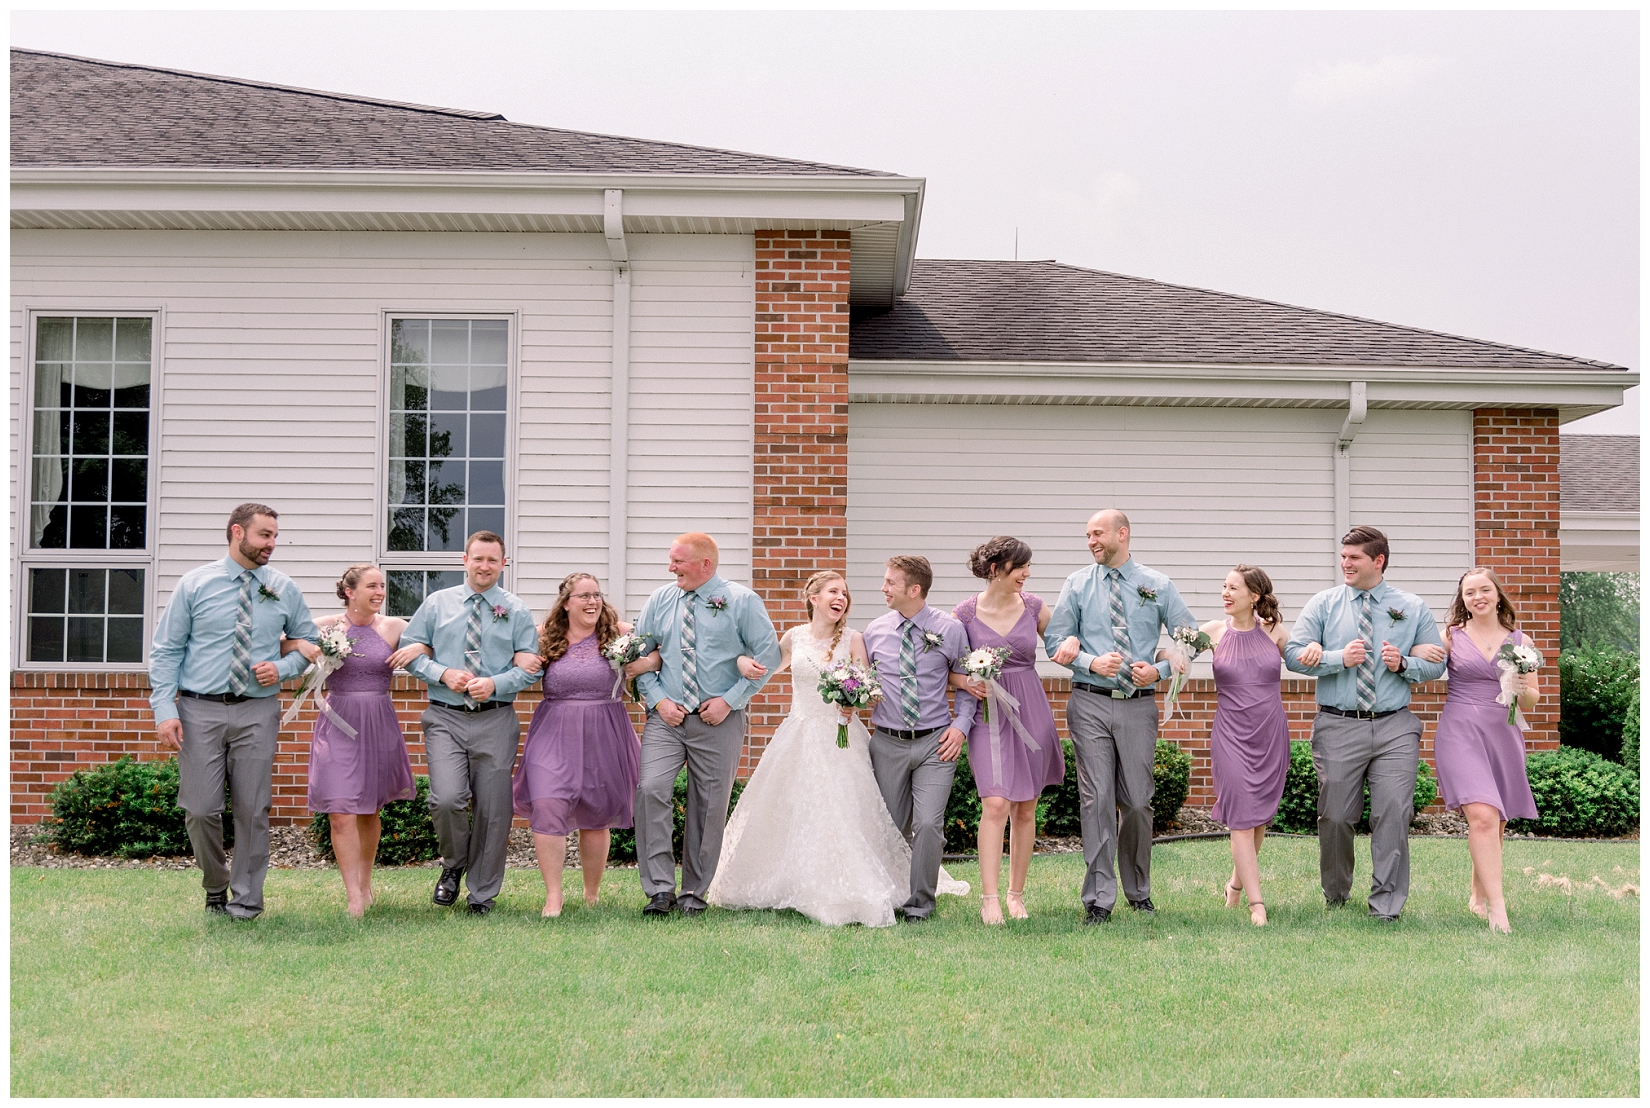 cat-alkire-wedding-photographer-indiana-chicago-indianapolis-fort-wayne_1300.jpg